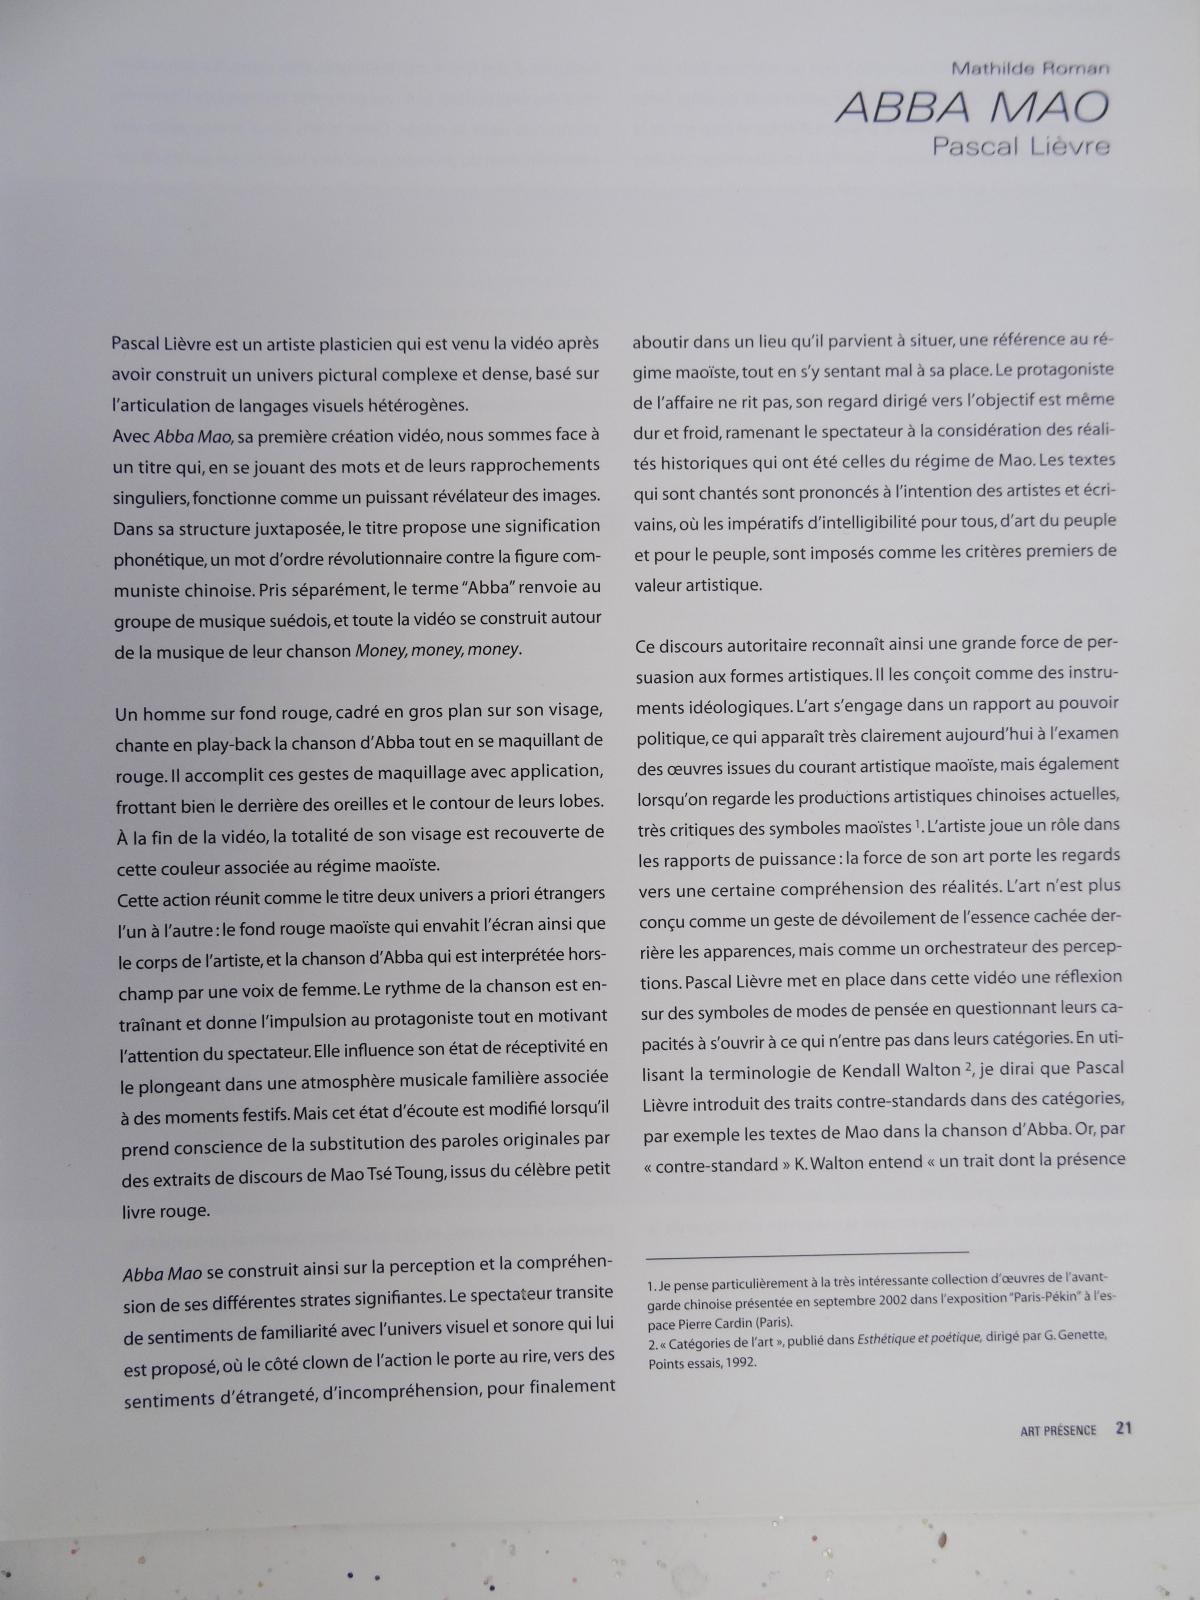 texte-mathilde-roman-art-presence-01